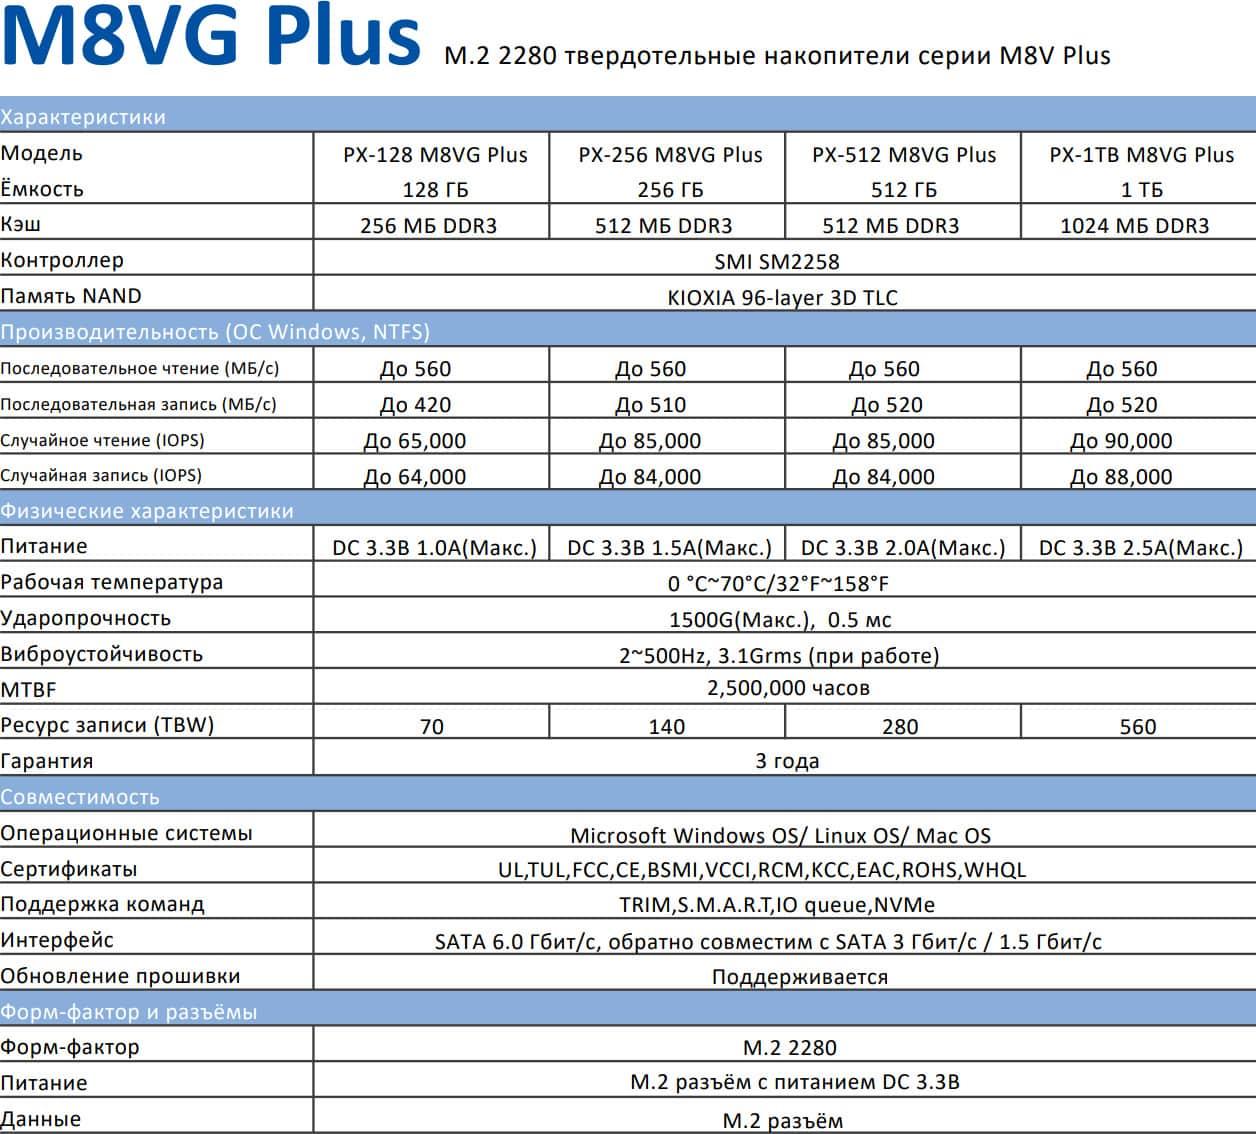 Plextor M8VG Plus 1 ТБ: обзор. SSD под любые нужды